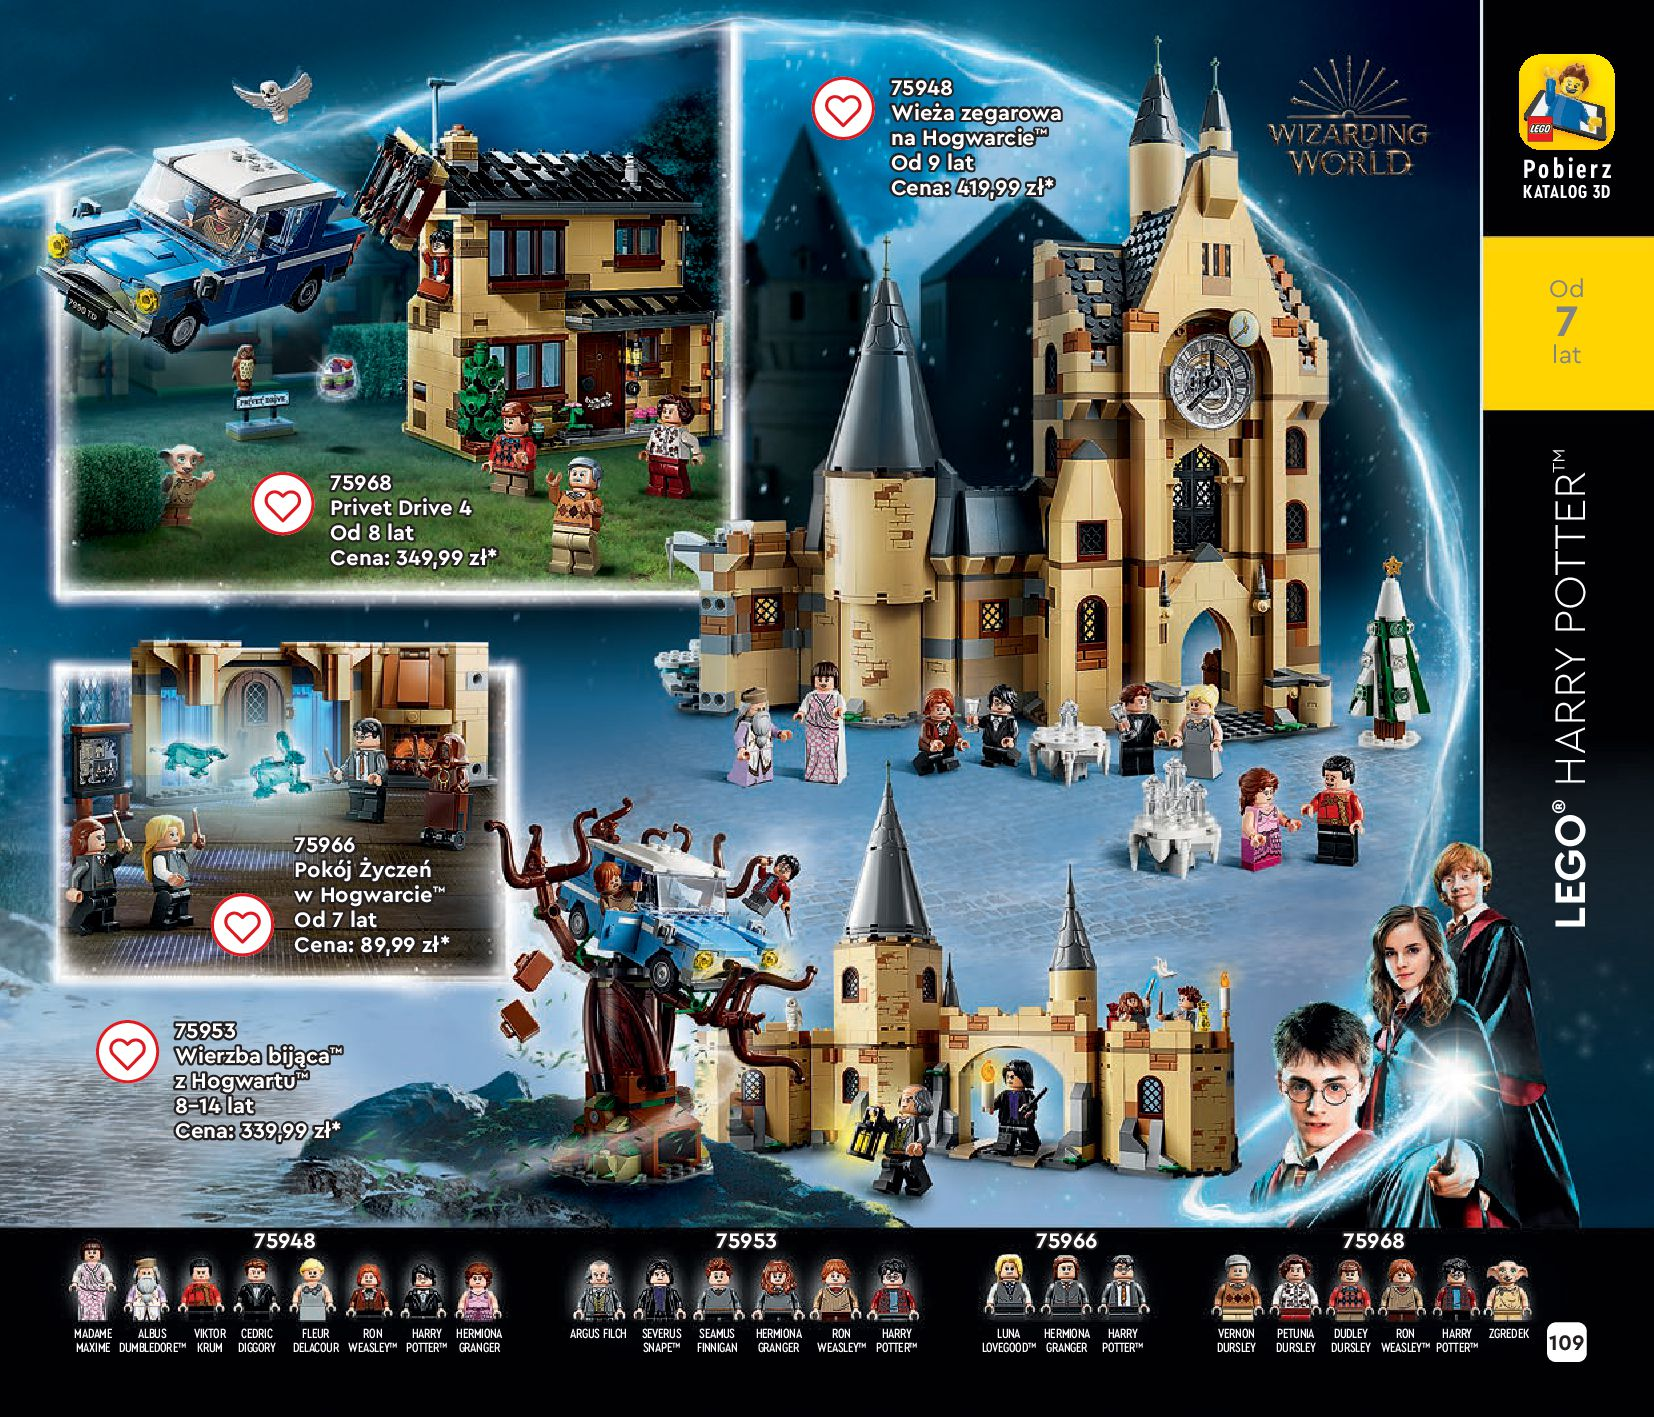 Gazetka LEGO: Gazetka LEGO - katalog 2021-06-30 page-109